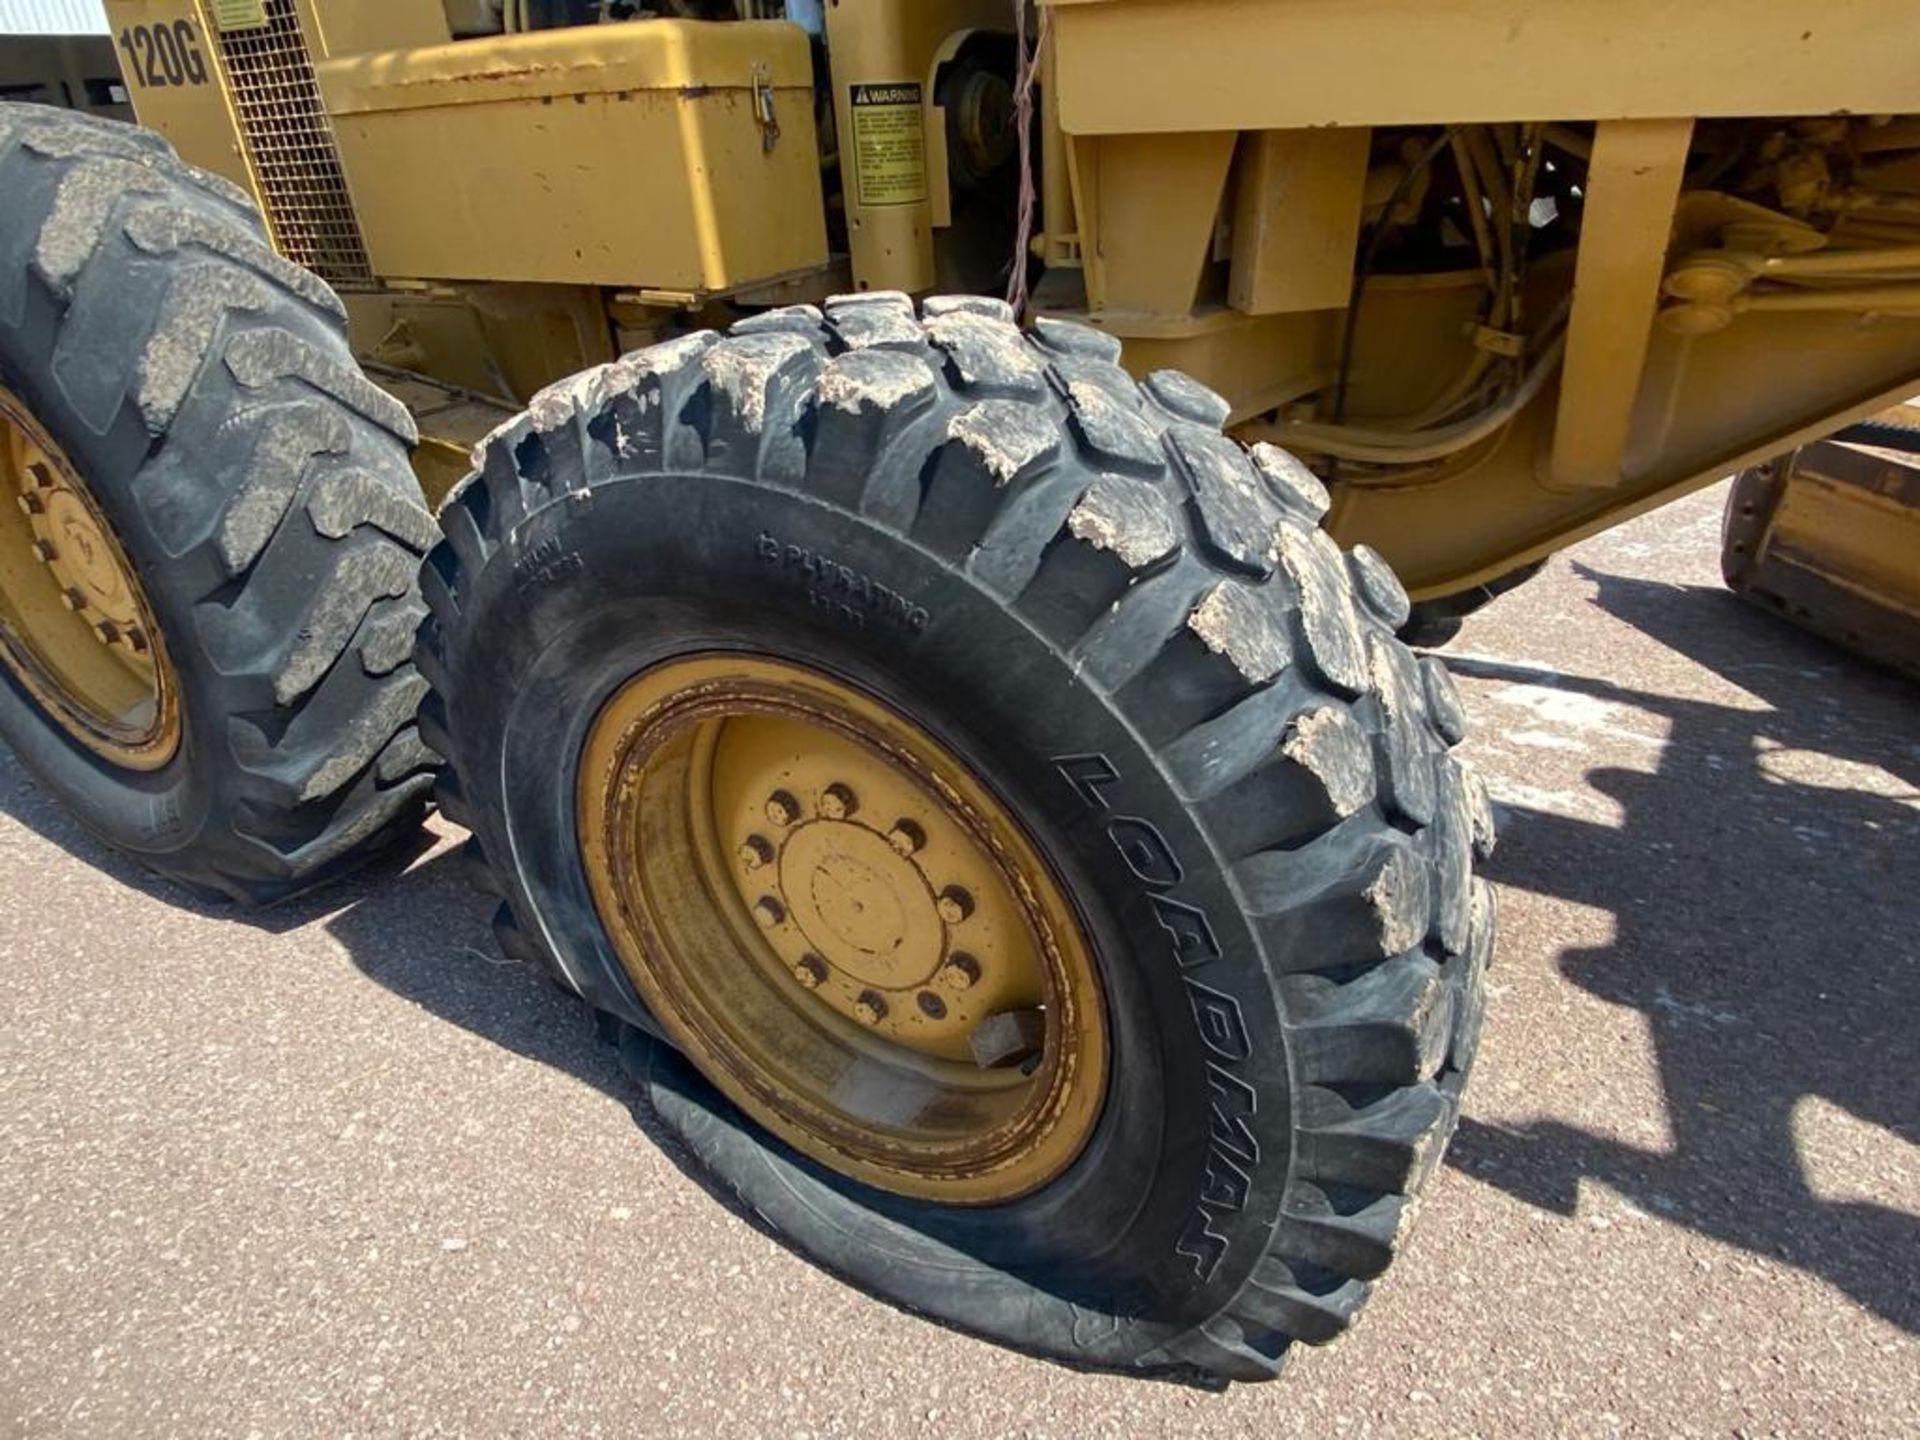 Caterpillar 120G Motor Grader, Serial number 87V09646, Motor number PQ883-2/07Z28983 - Image 55 of 61